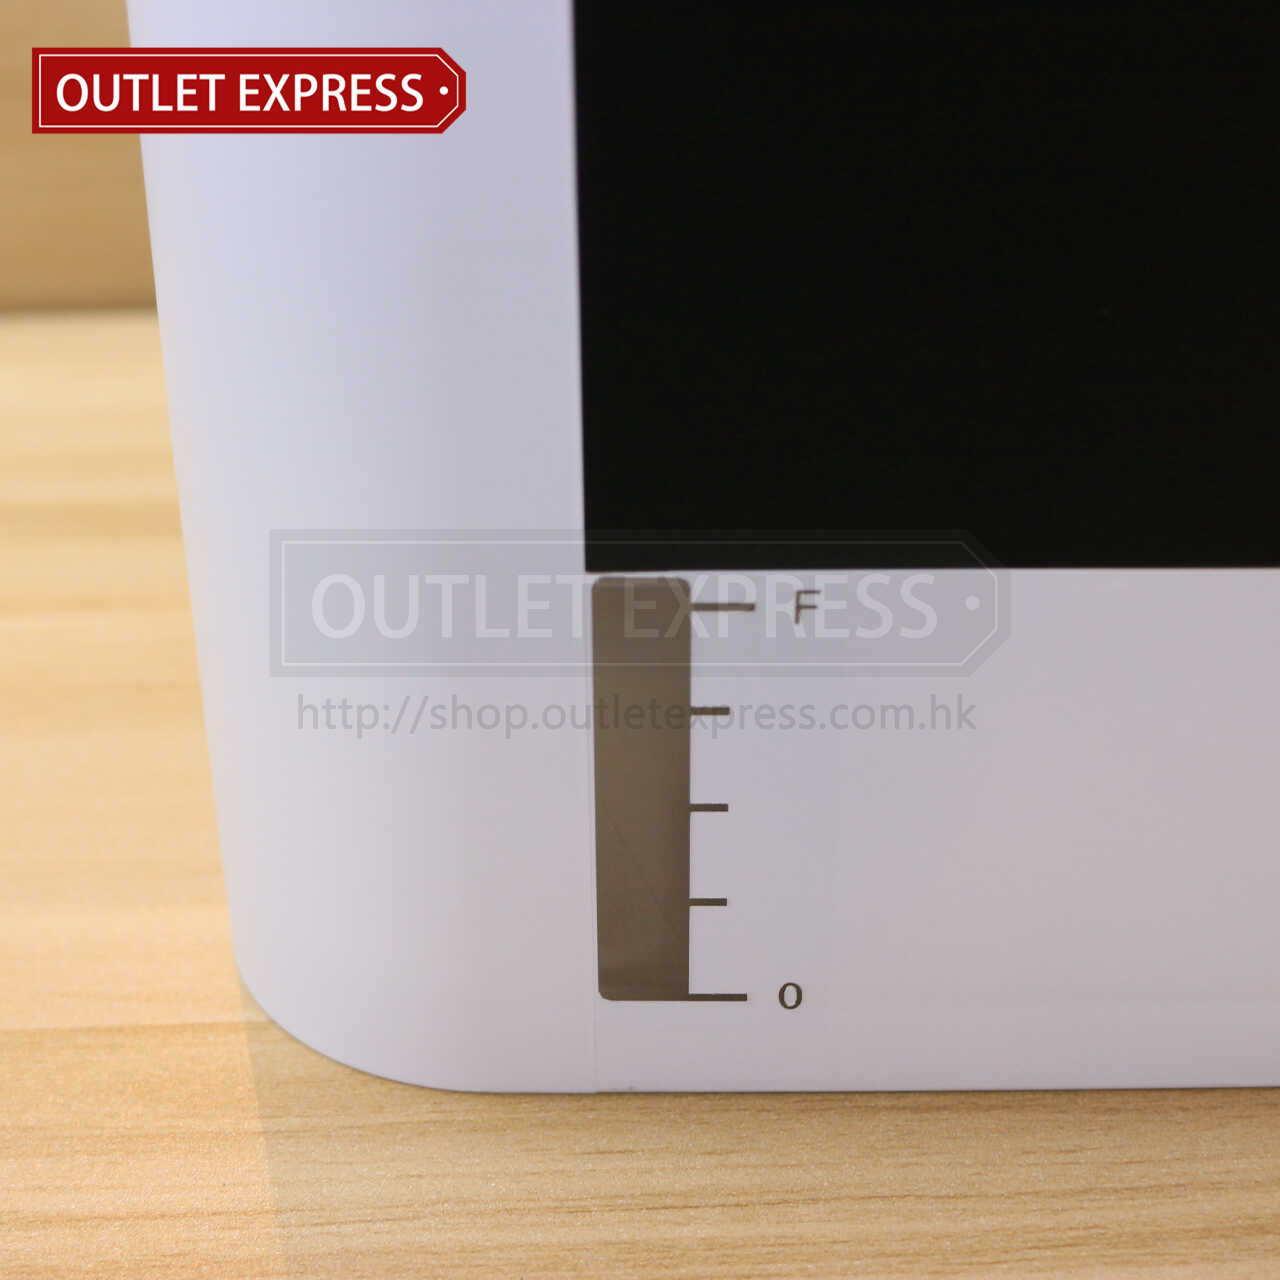 IDI USB 納米攜帶冷風機- Outlet Express HK生活百貨城實拍相片